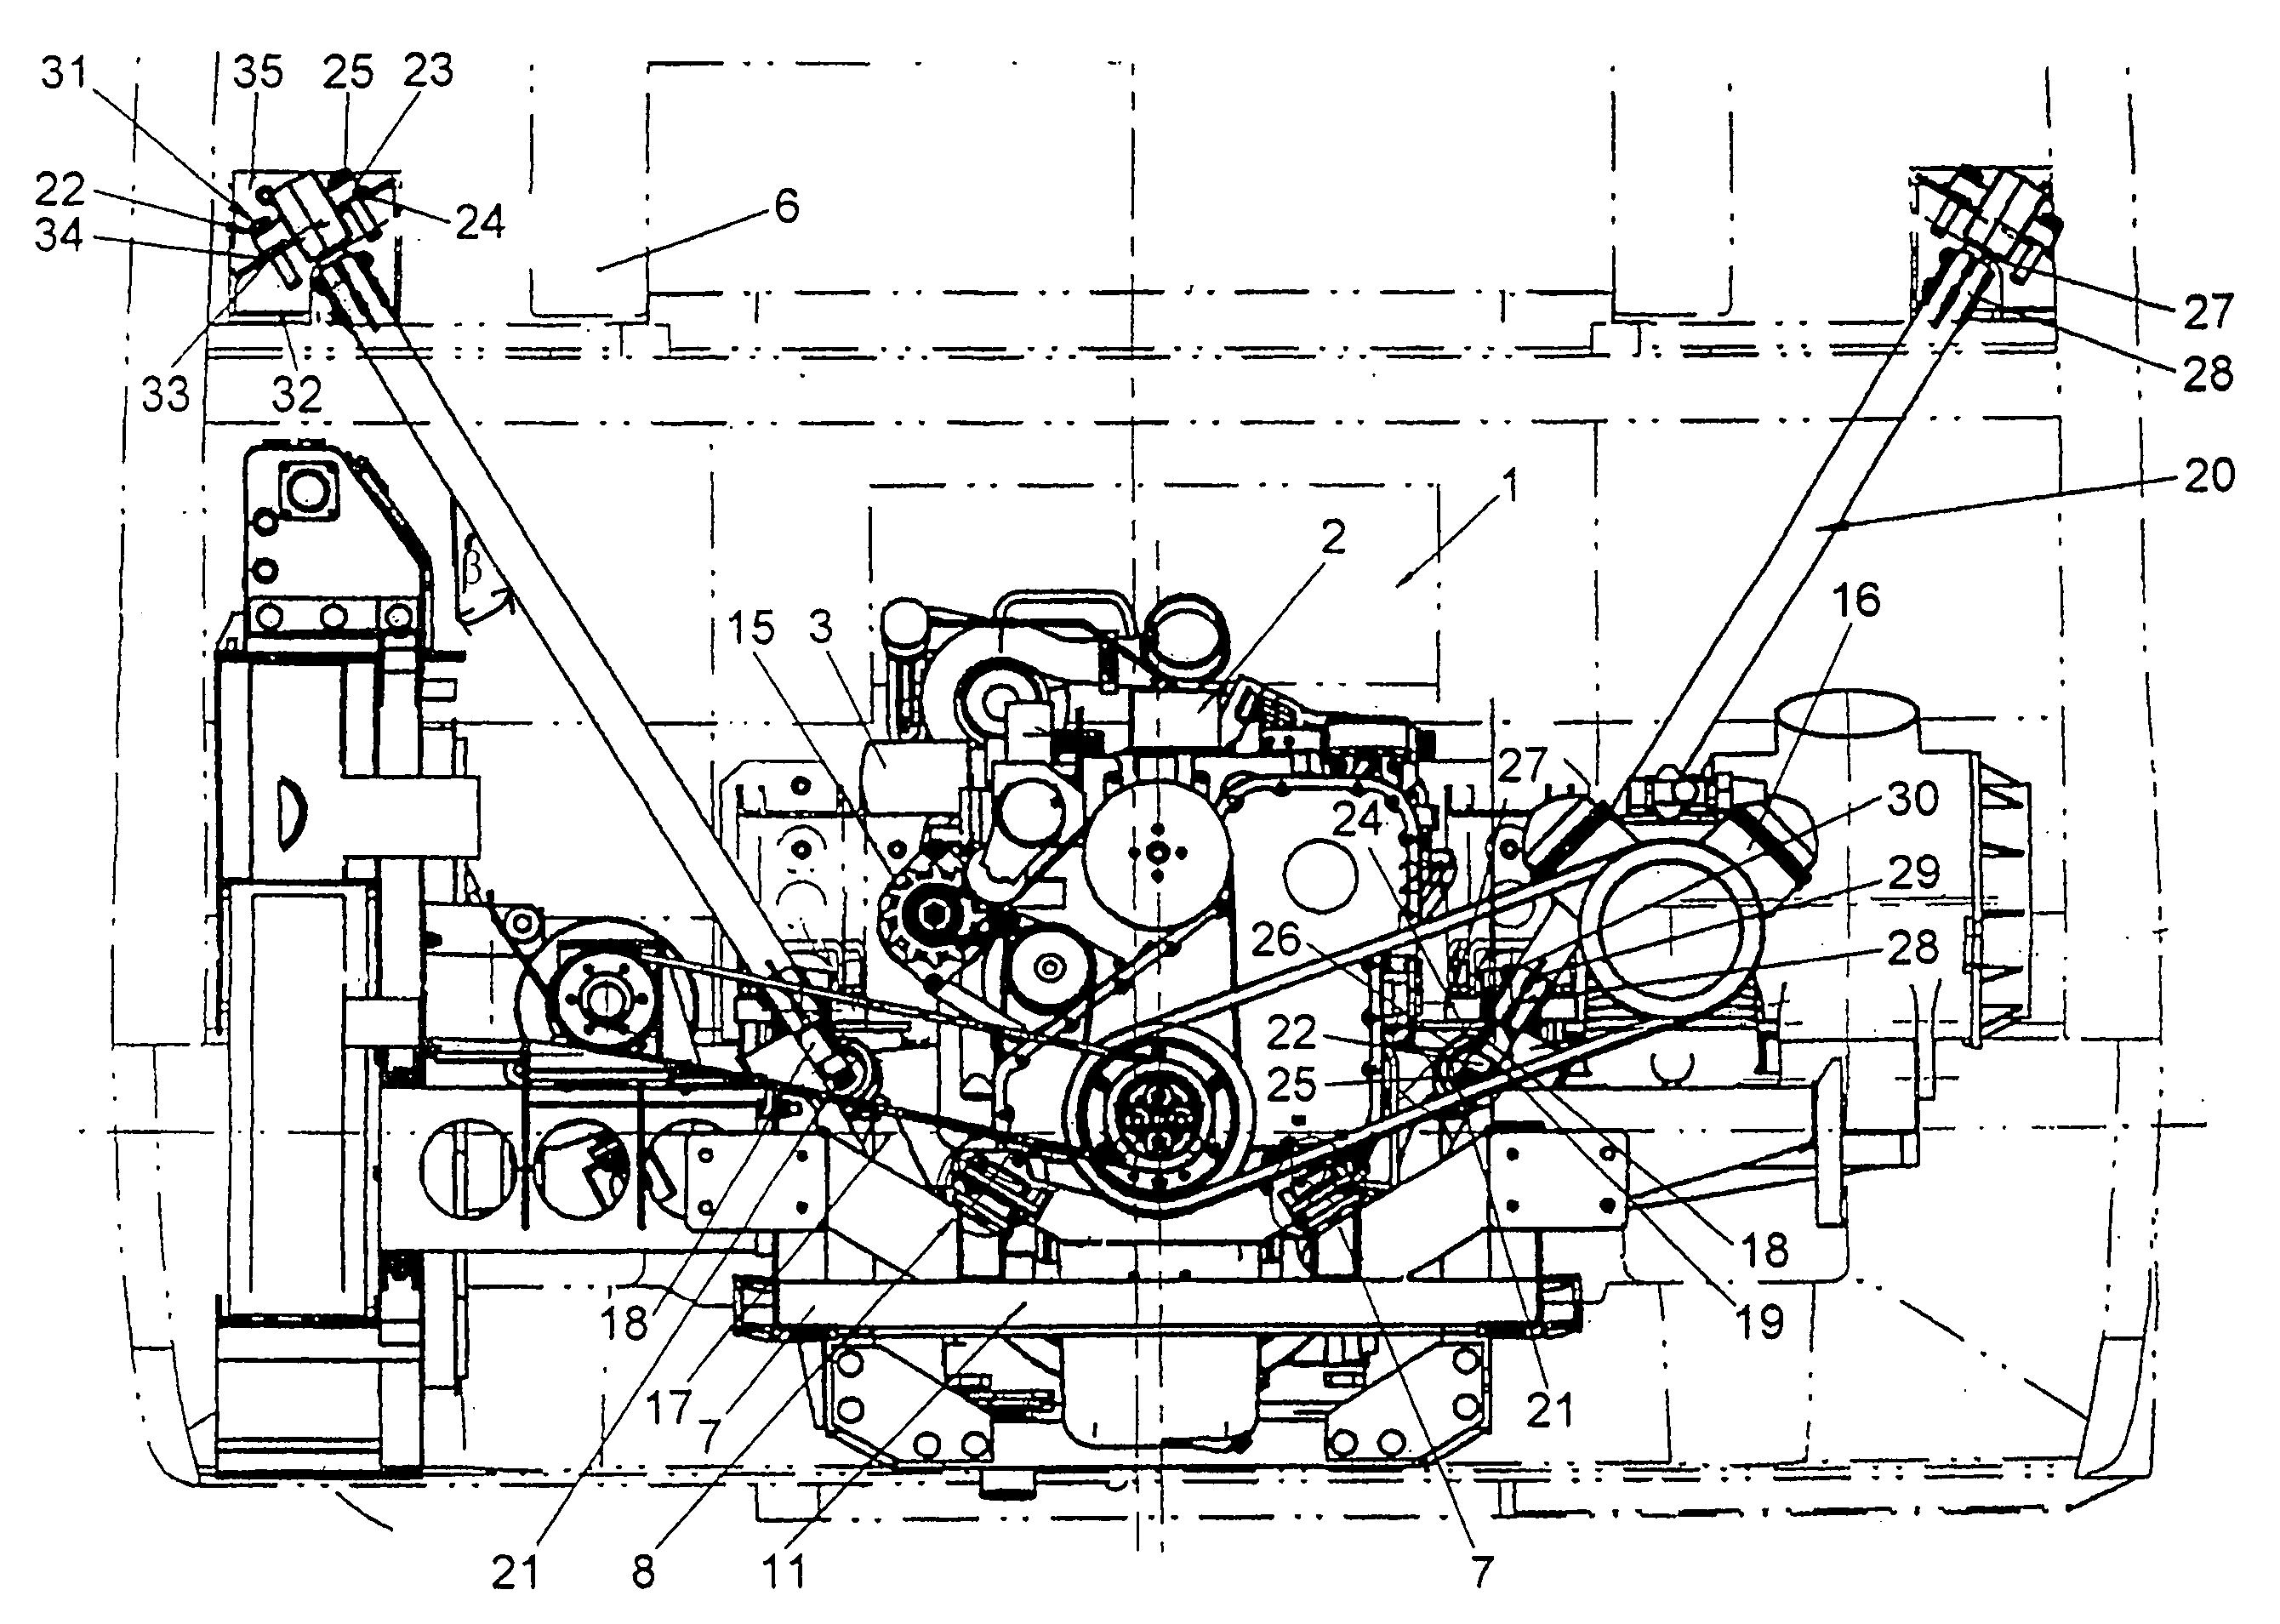 Rear Engine Diagram 06 F150 Fuse Box Diagram – Diagram Of Rear Engine 3116